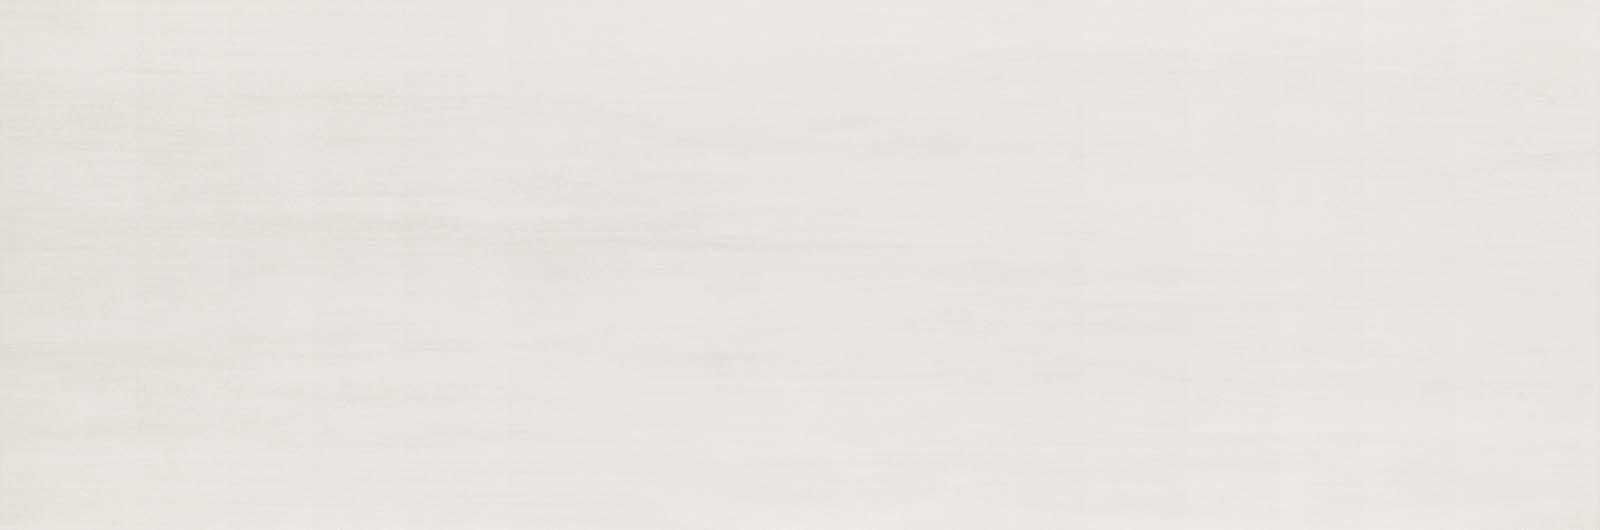 Стенни плочки Materika Off White 40x120